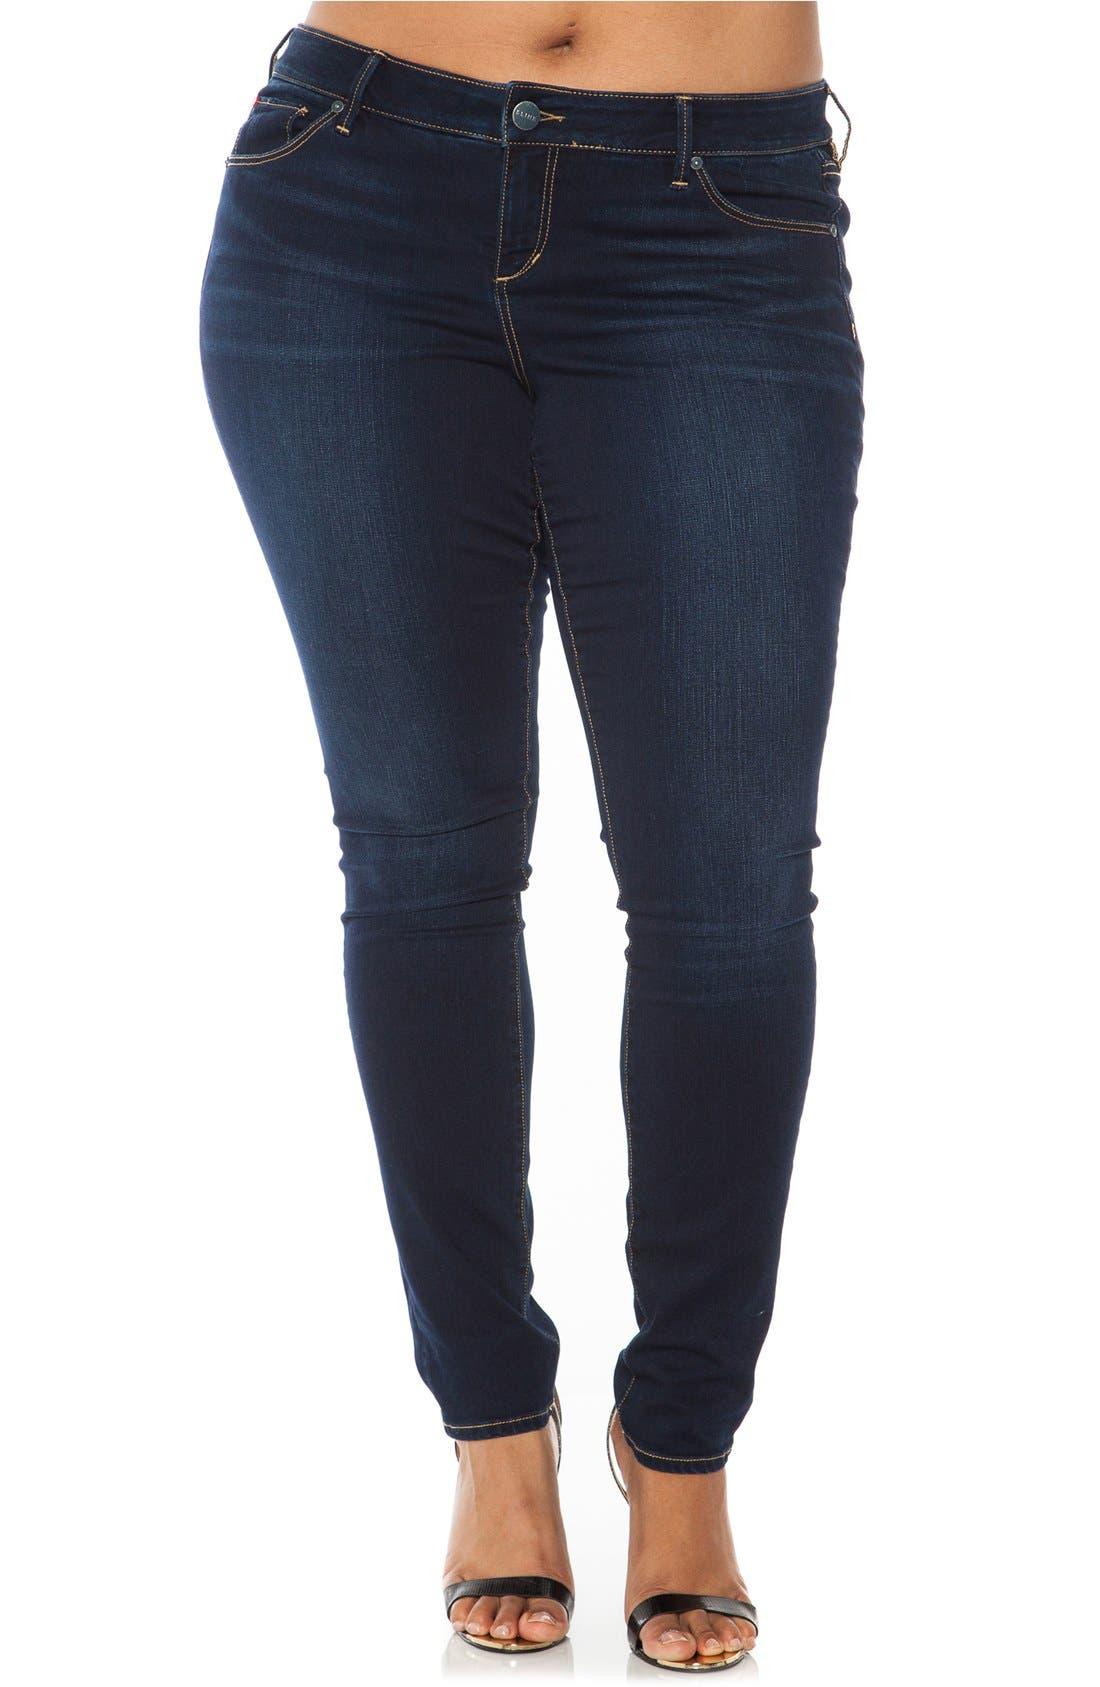 Main Image - SLINK Jeans 'The Skinny' Stretch Denim Jeans (Amber) (Plus Size)